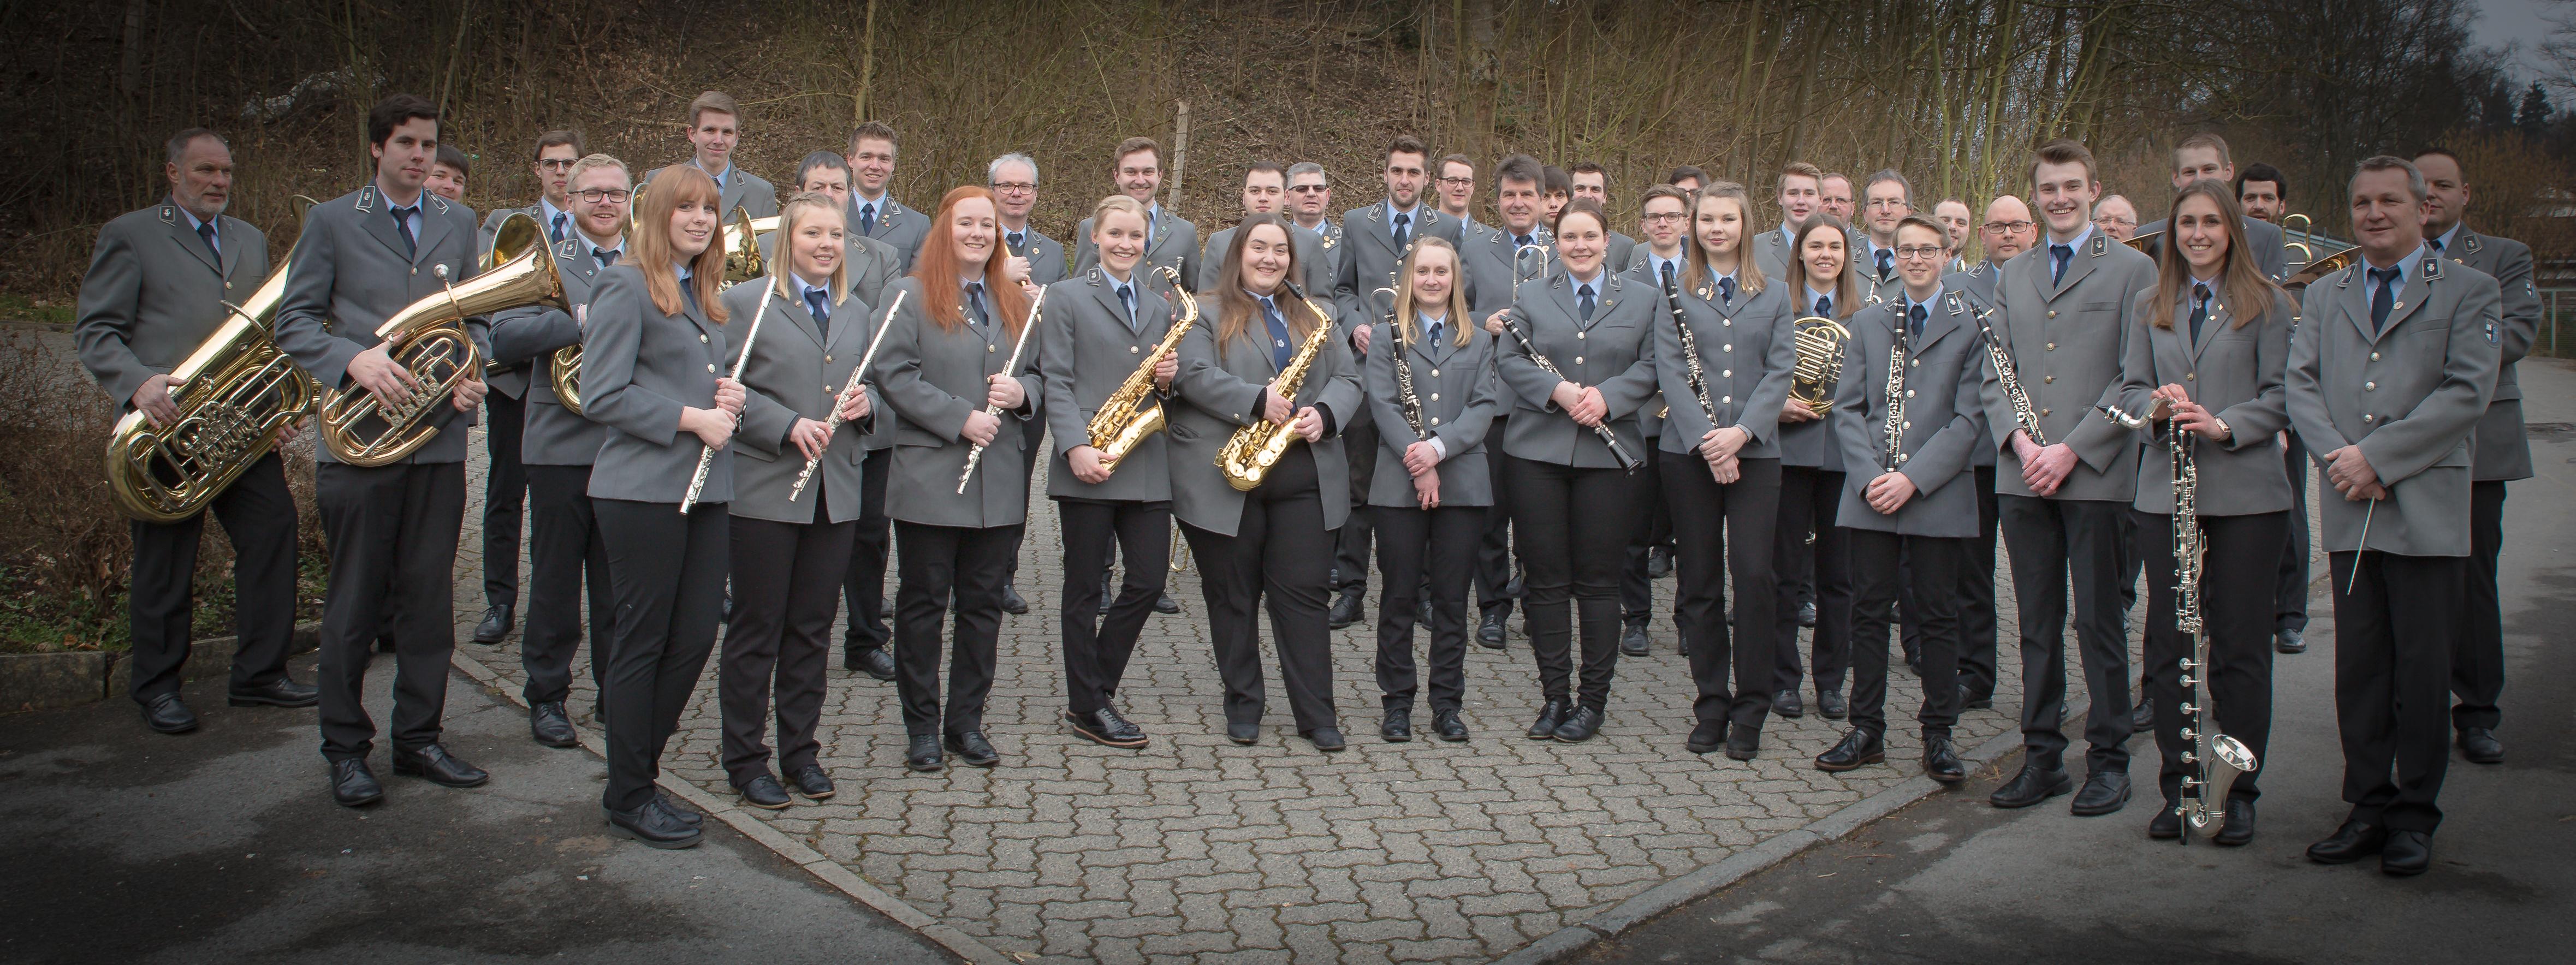 Orchester_Draussen